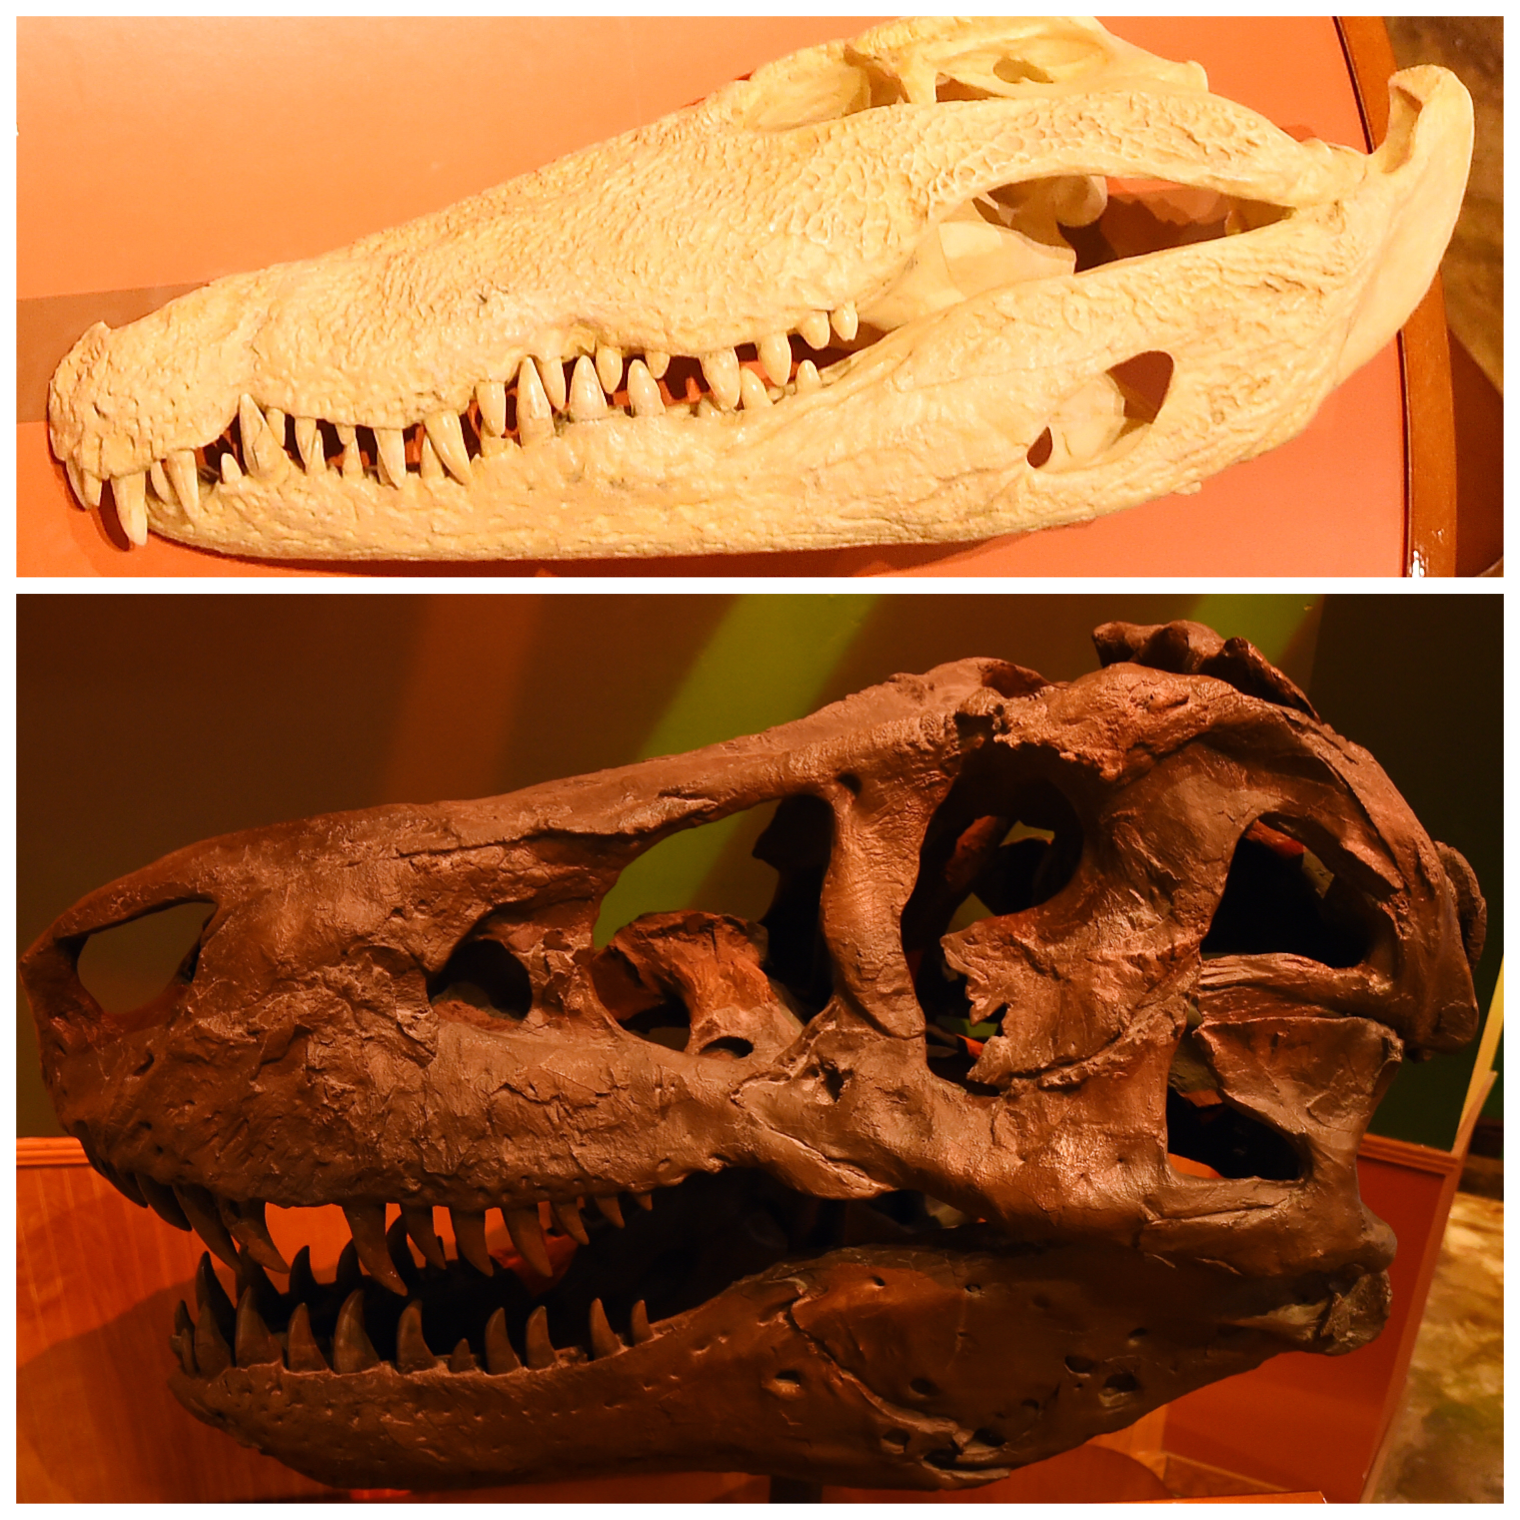 True Or False A Crocodile Has A Higher Bite Force Than